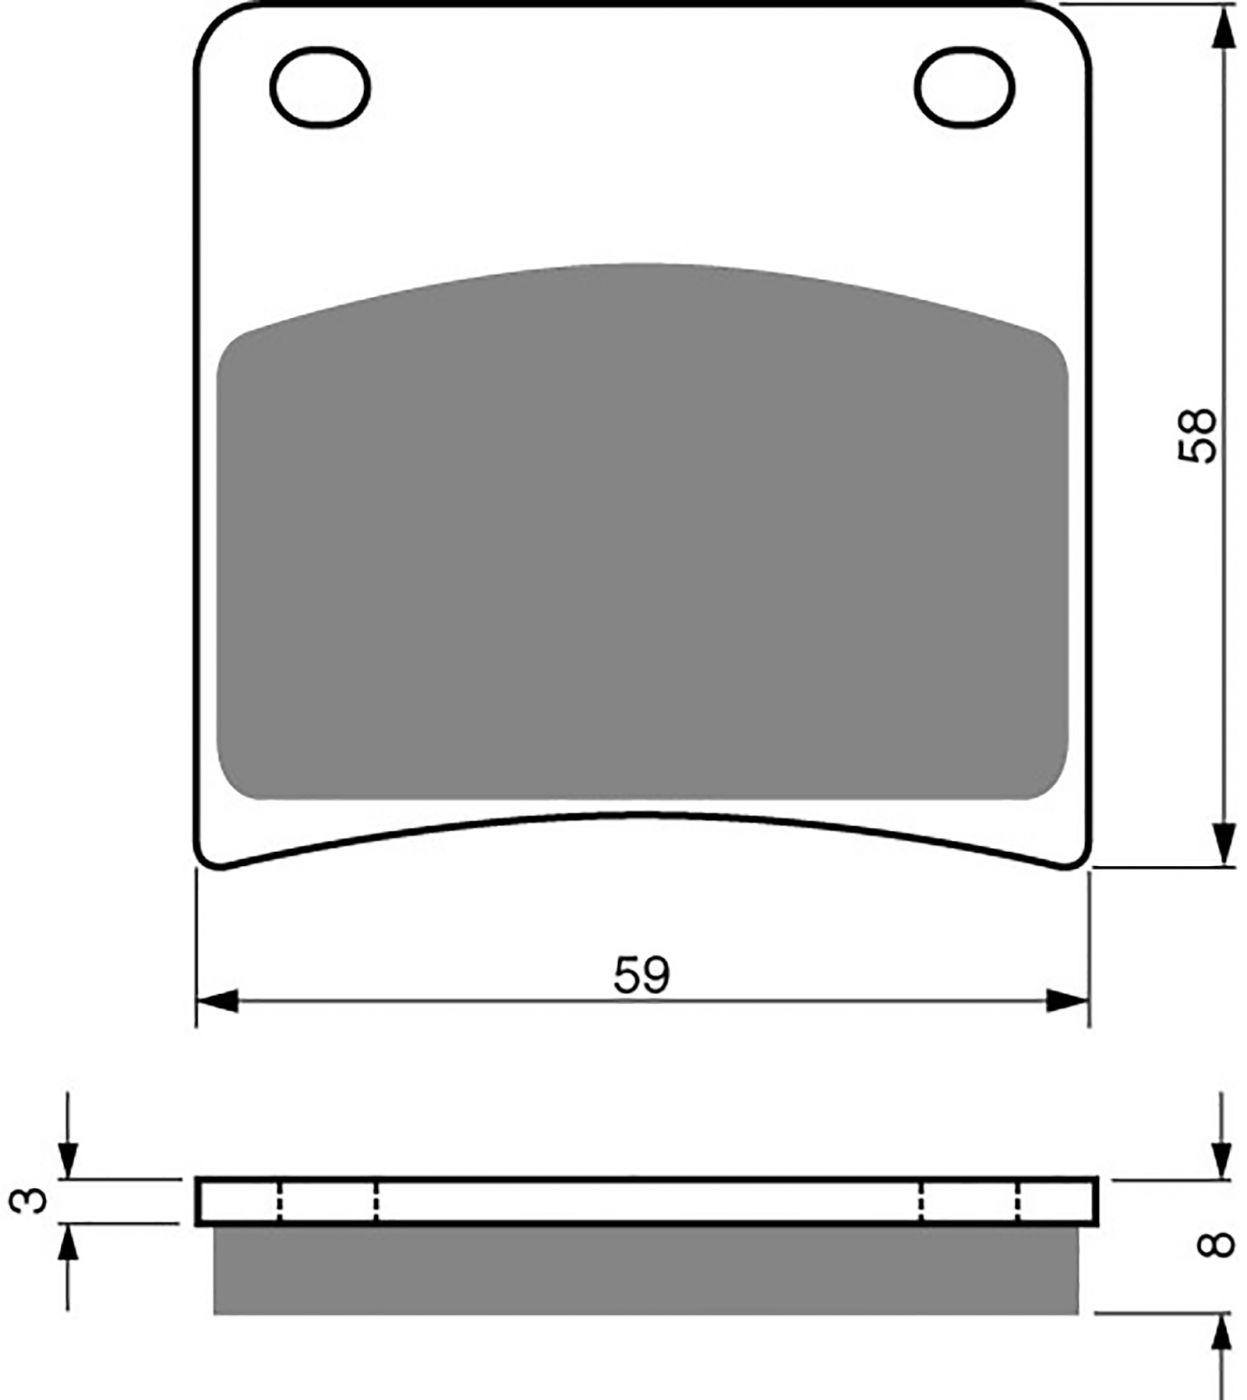 goldfren s33 brake pads - 700027GS image